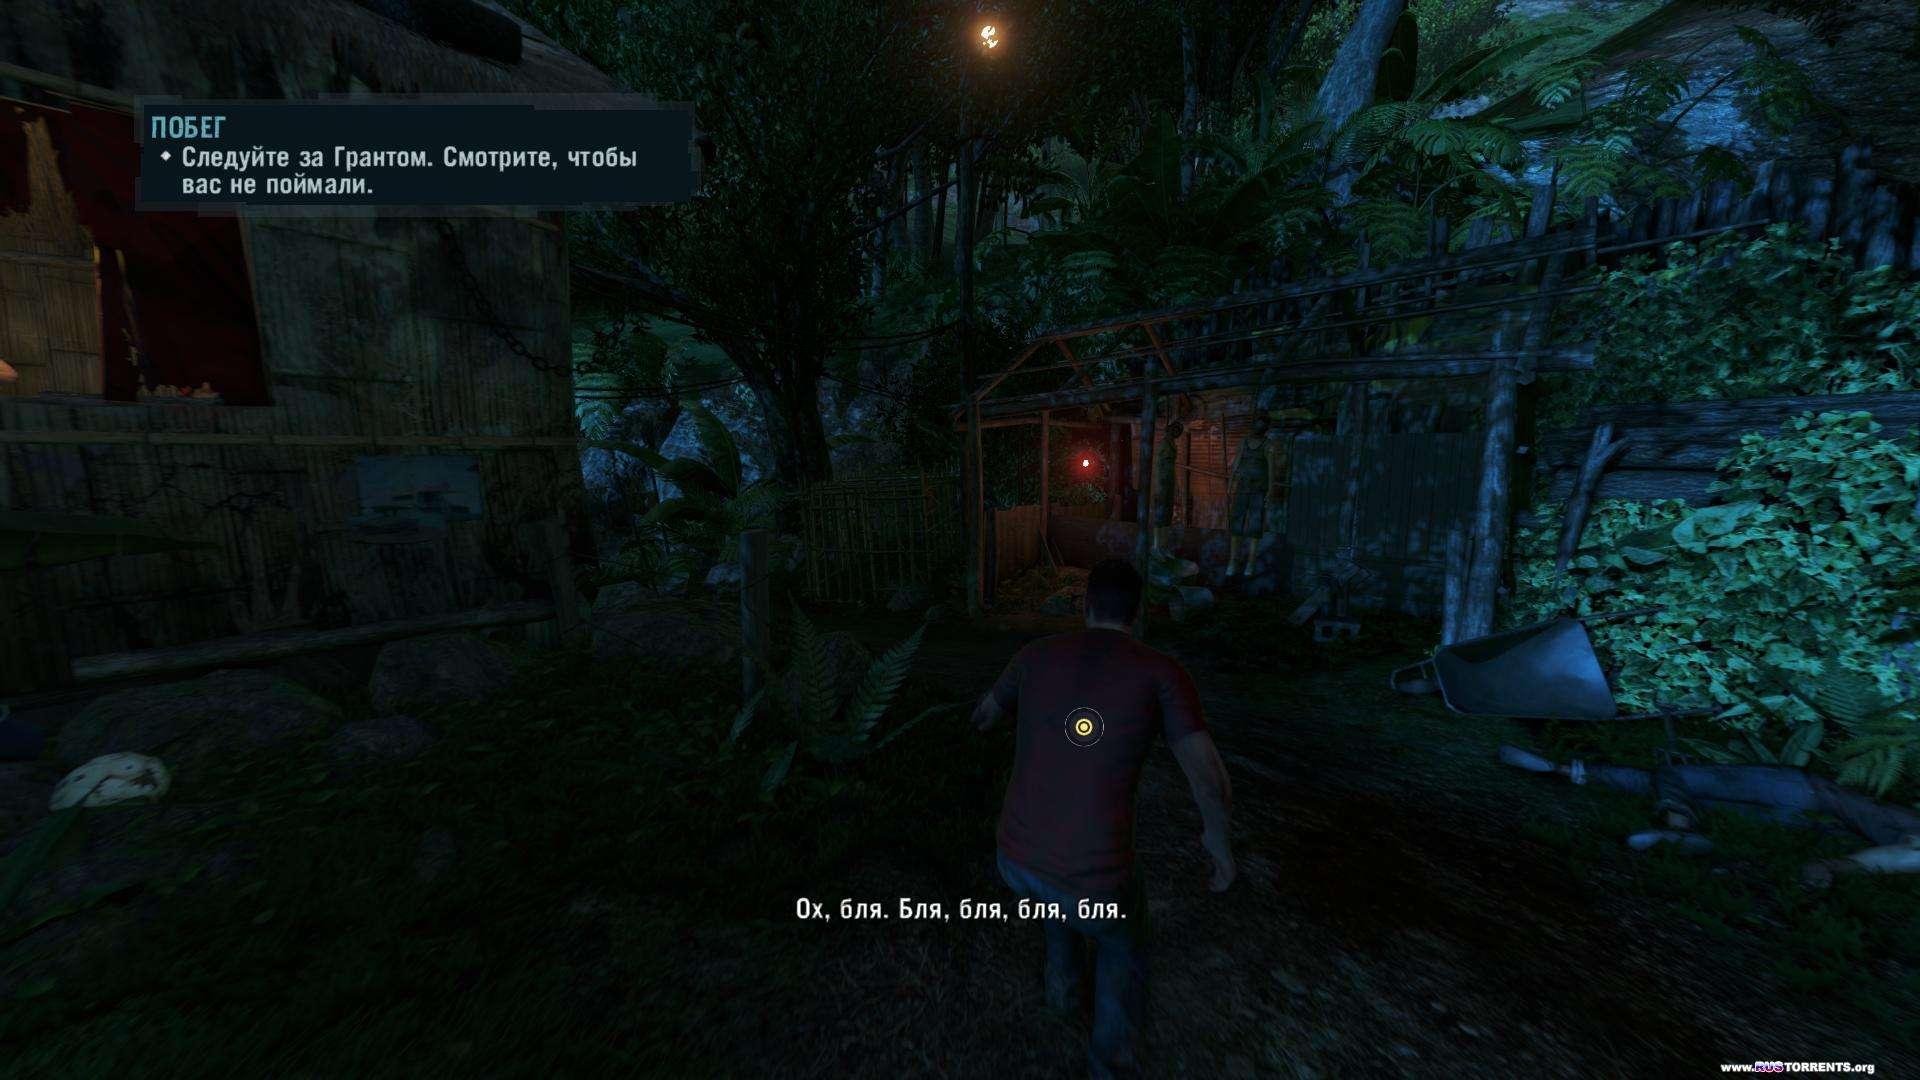 Far Cry 3: Deluxe Edition [v 1.05 + 1 DLC] | RePack от Fenixx